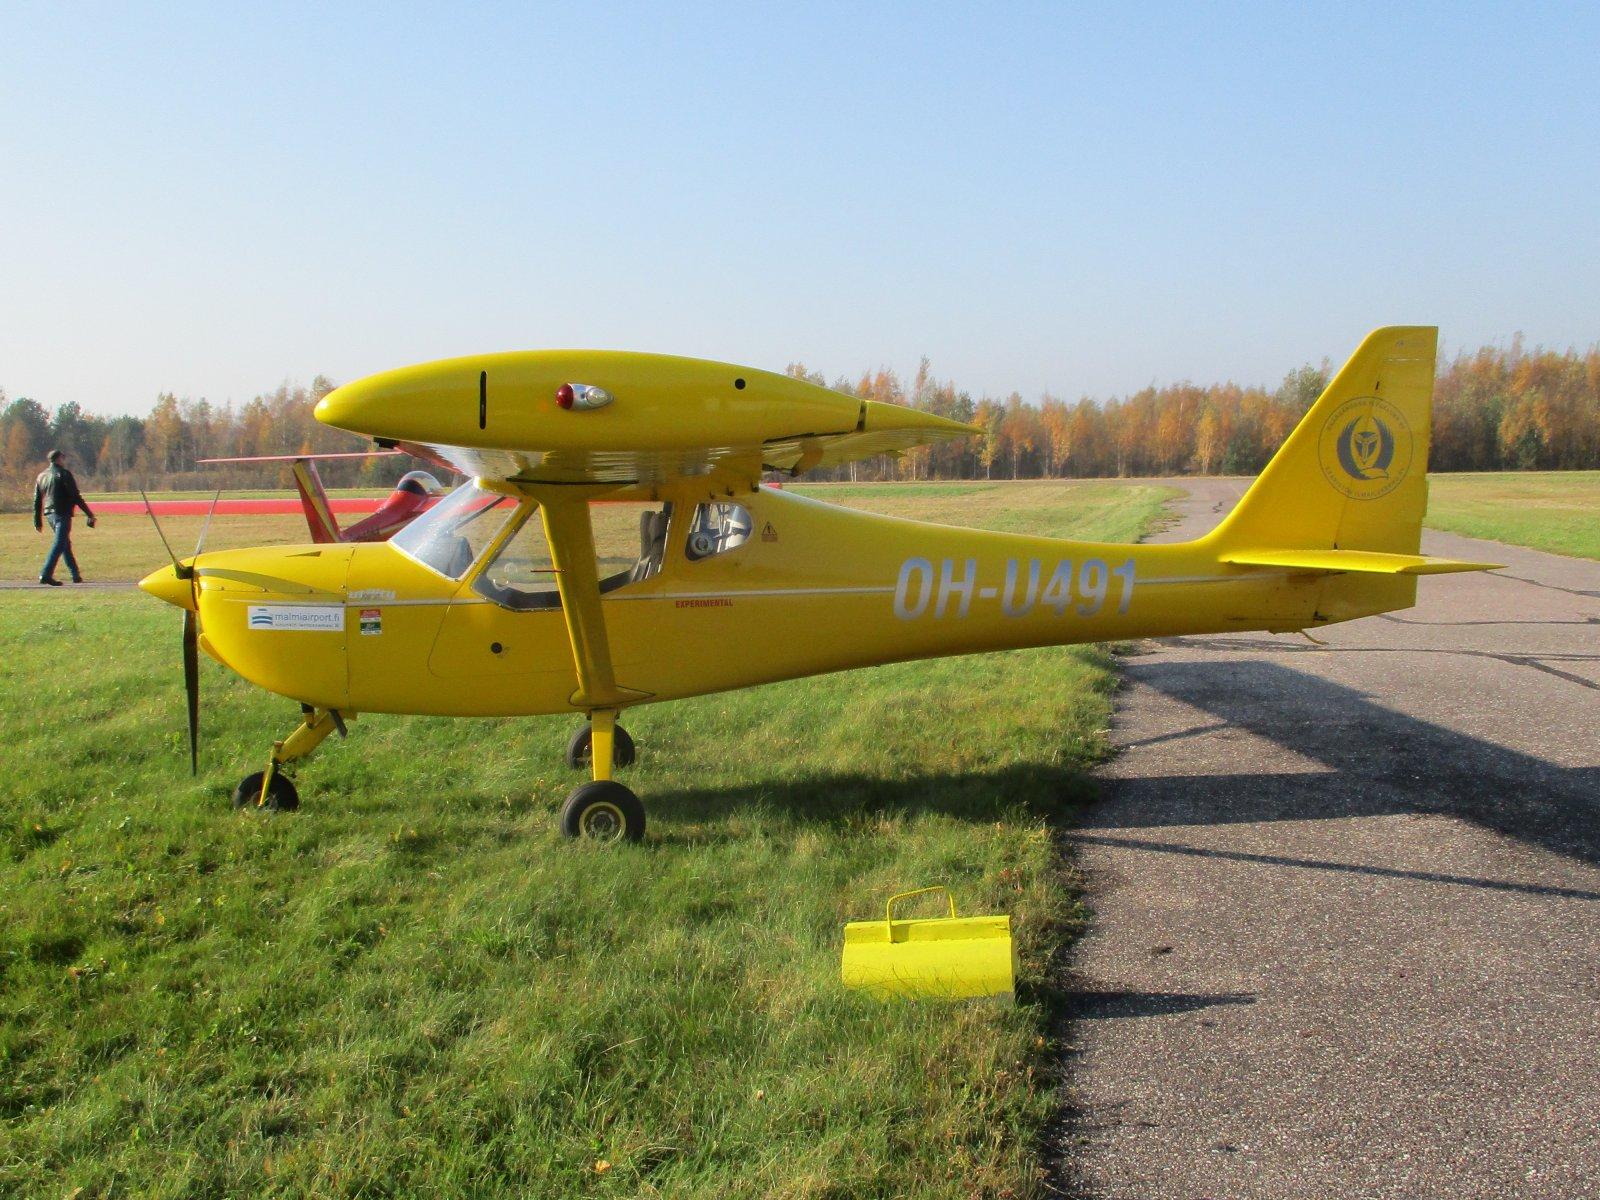 B&F Technik FK9 Mark IV OH-U491 EFHN 2018-10-14